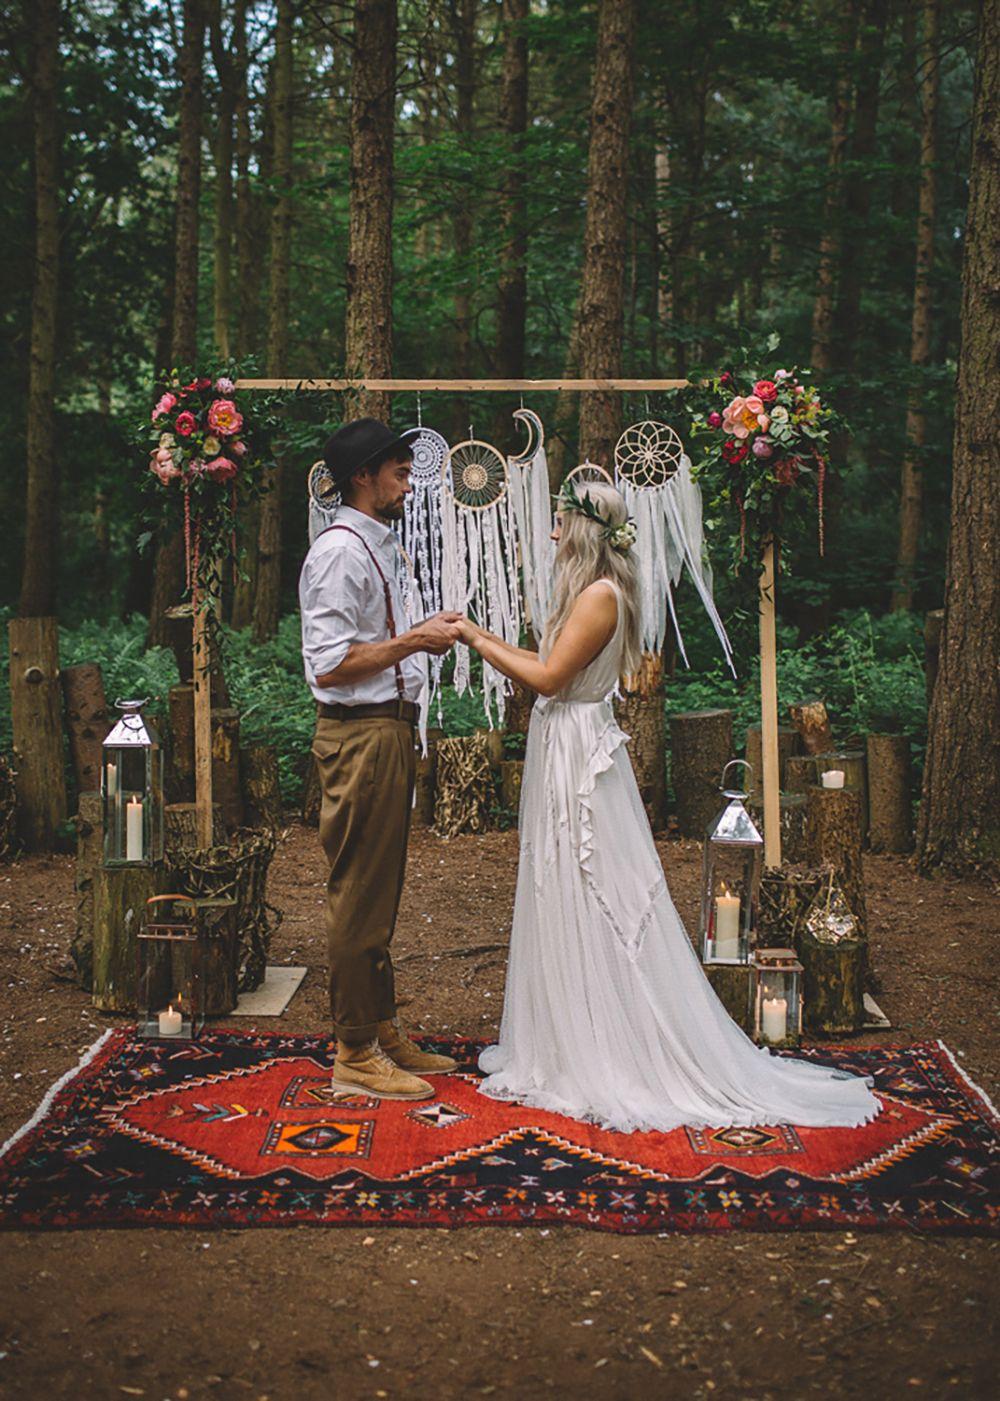 Free Spirited Woodland Bohemian Wedding Ideas at Camp Katur | Whimsical Wonderland Weddings